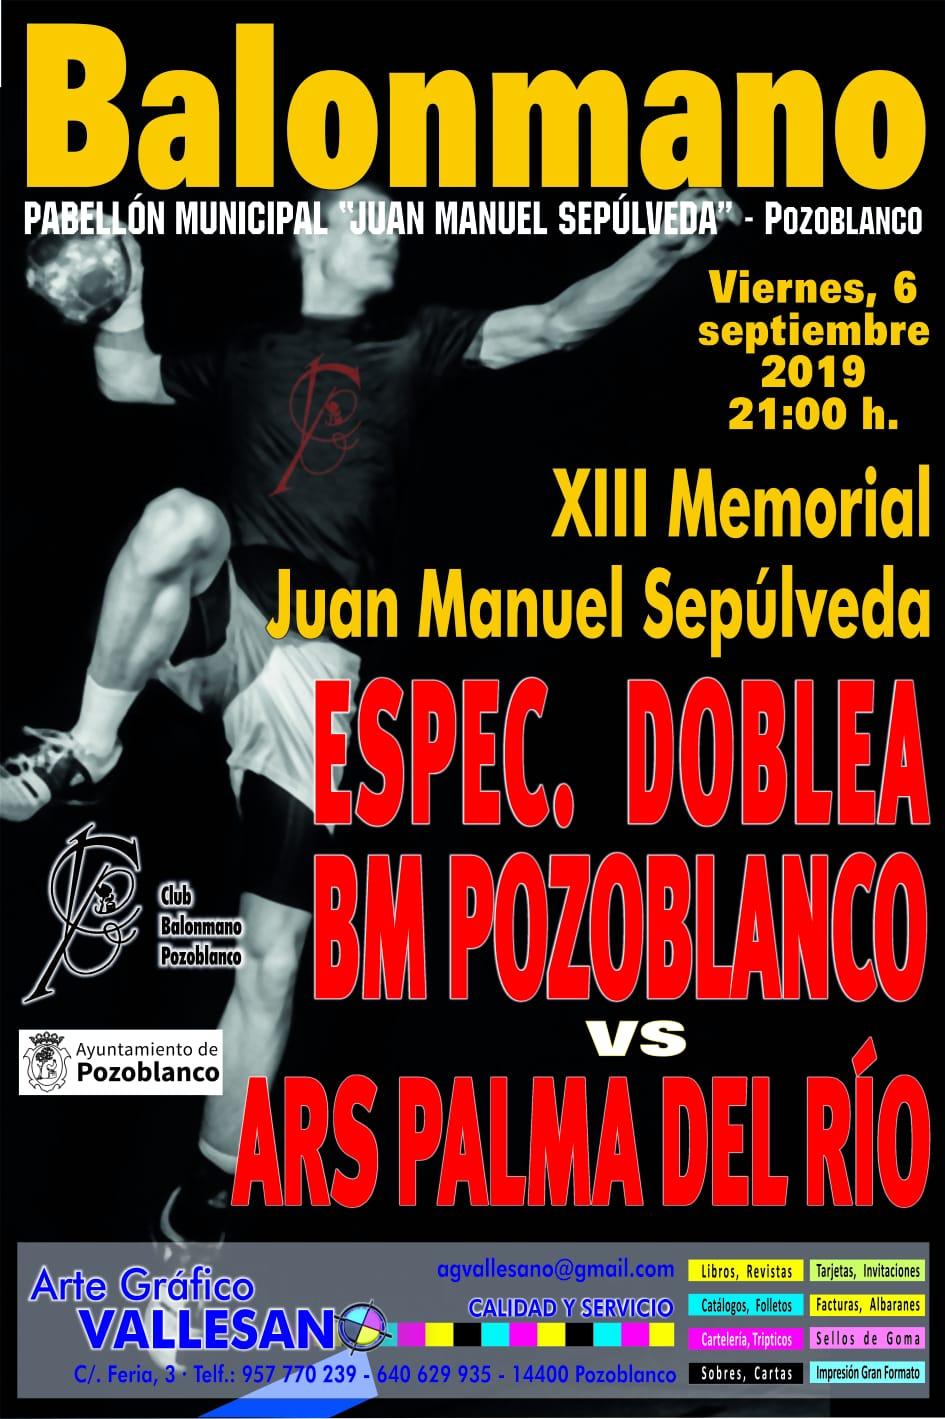 XIII Memorial Juan Manuel Sepúlveda